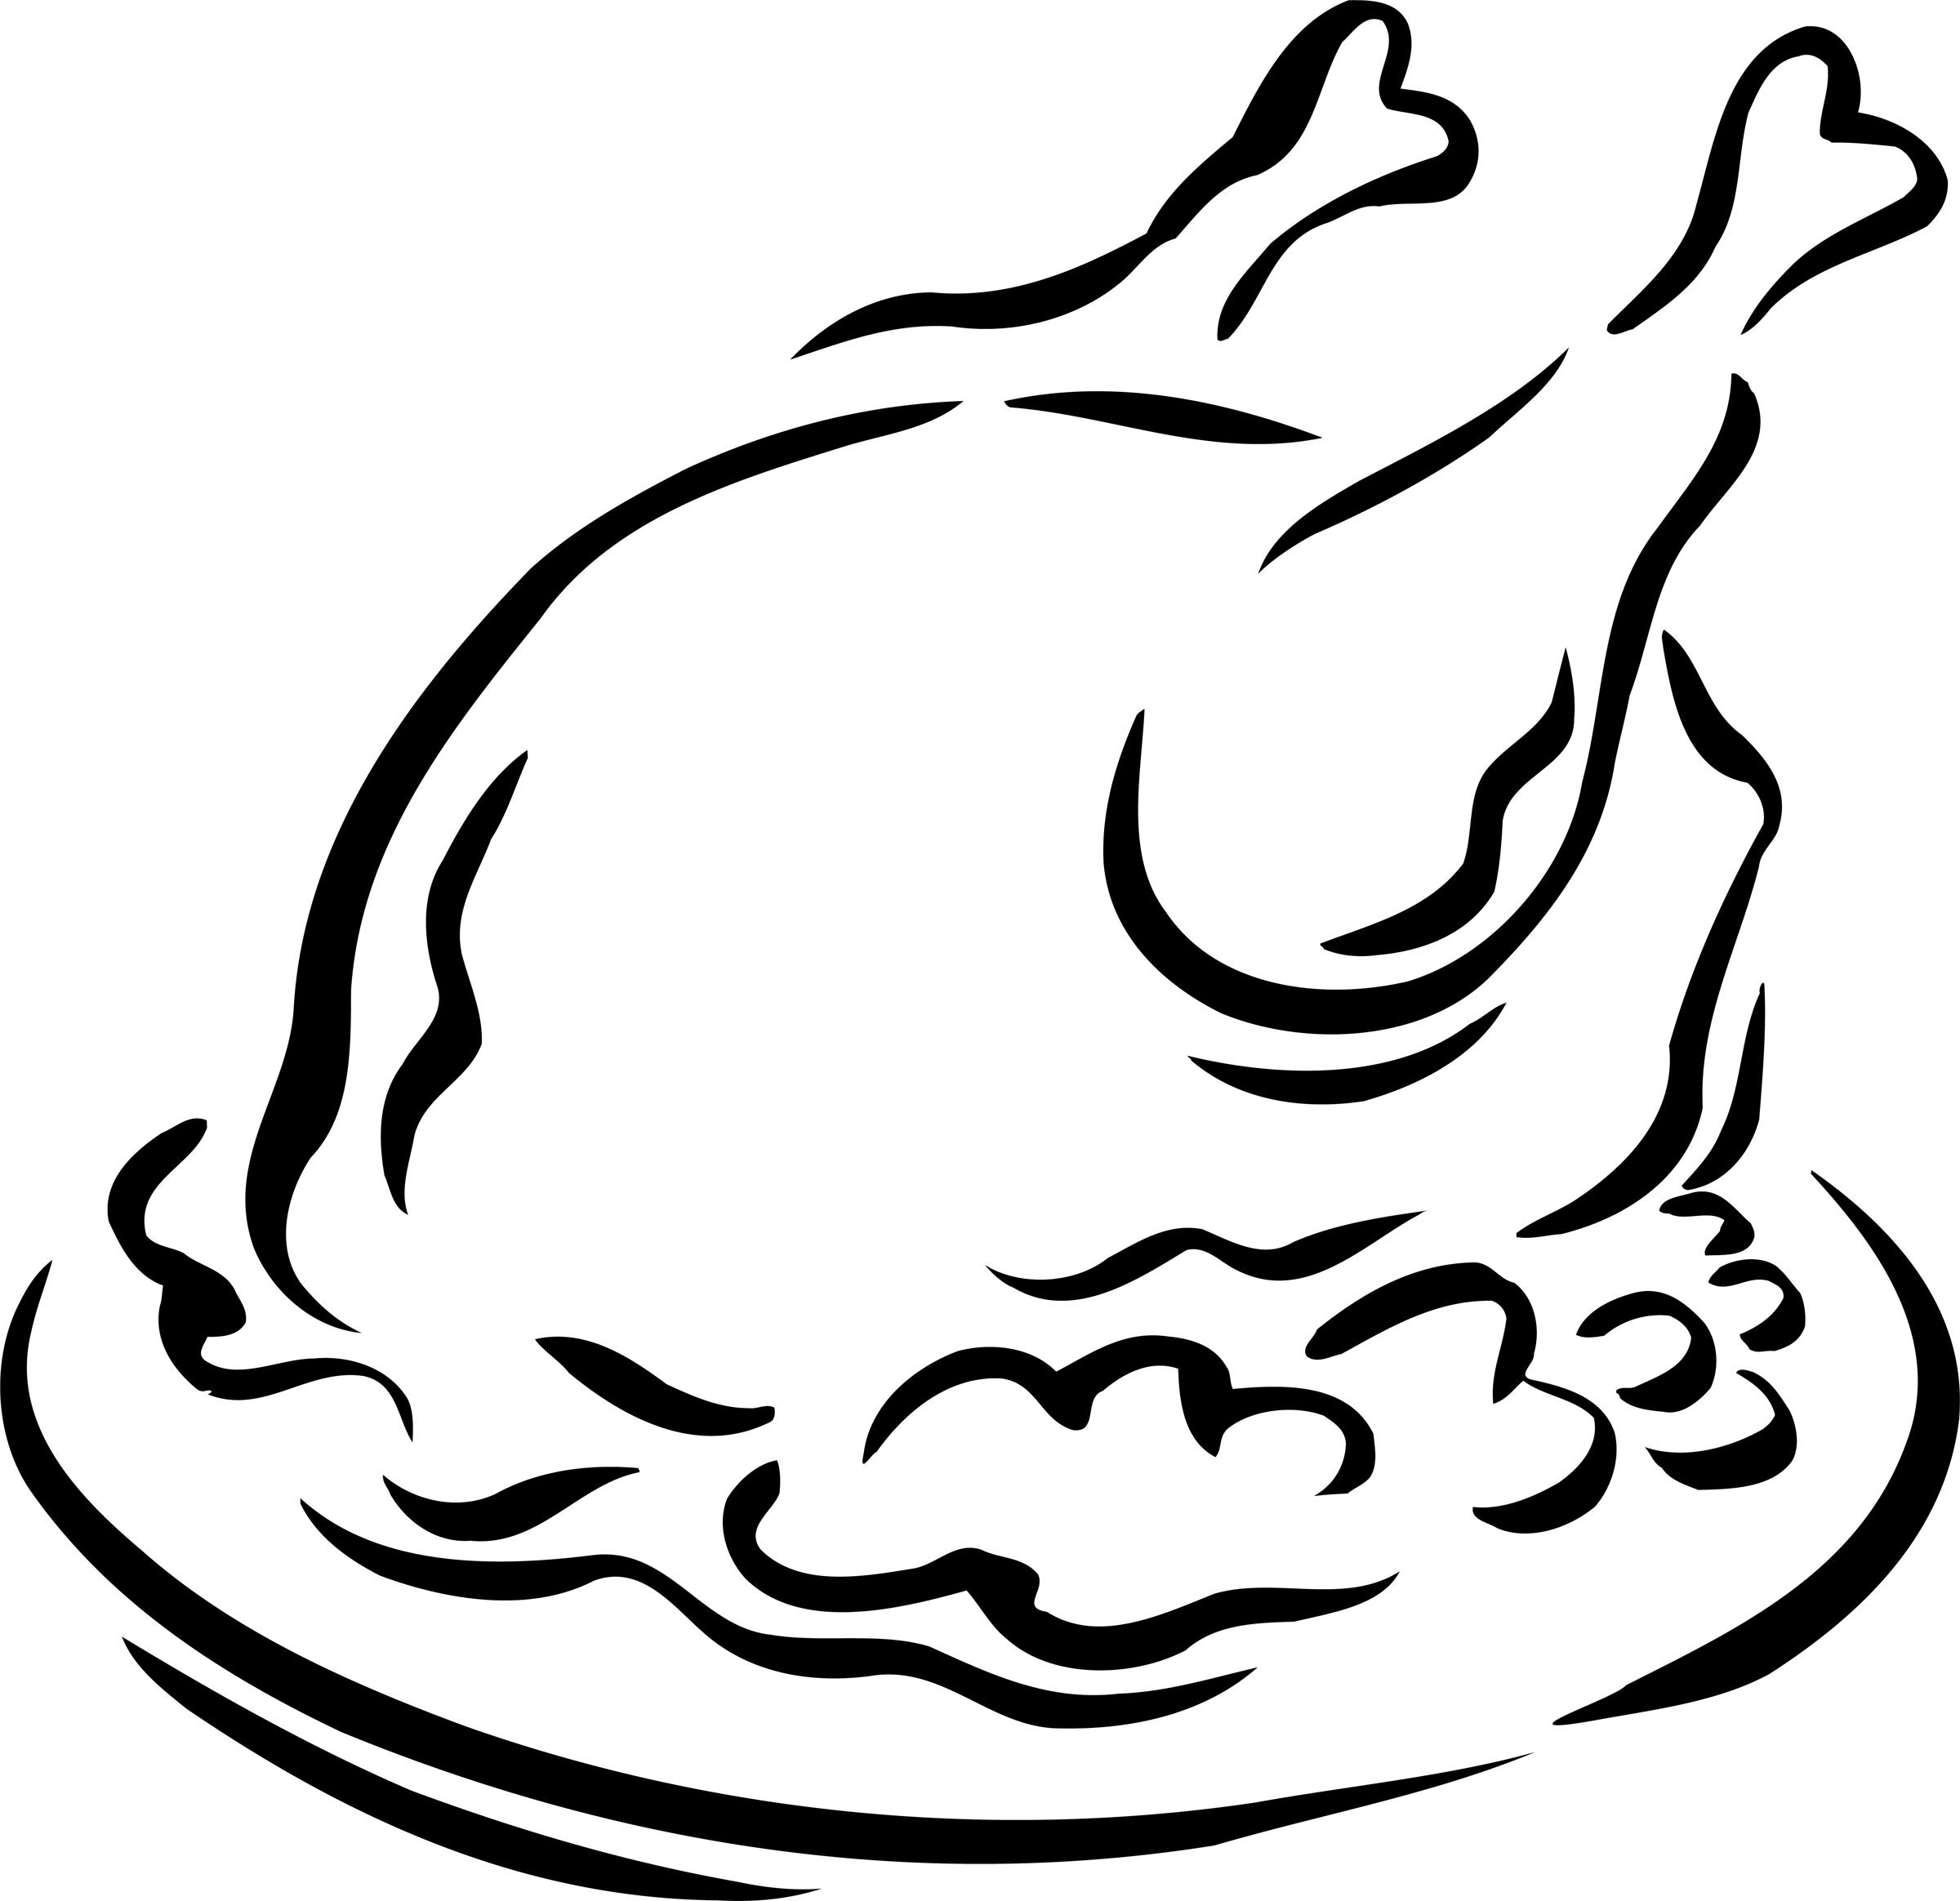 image free stock Clip art library . Mashed clipart potato bar.